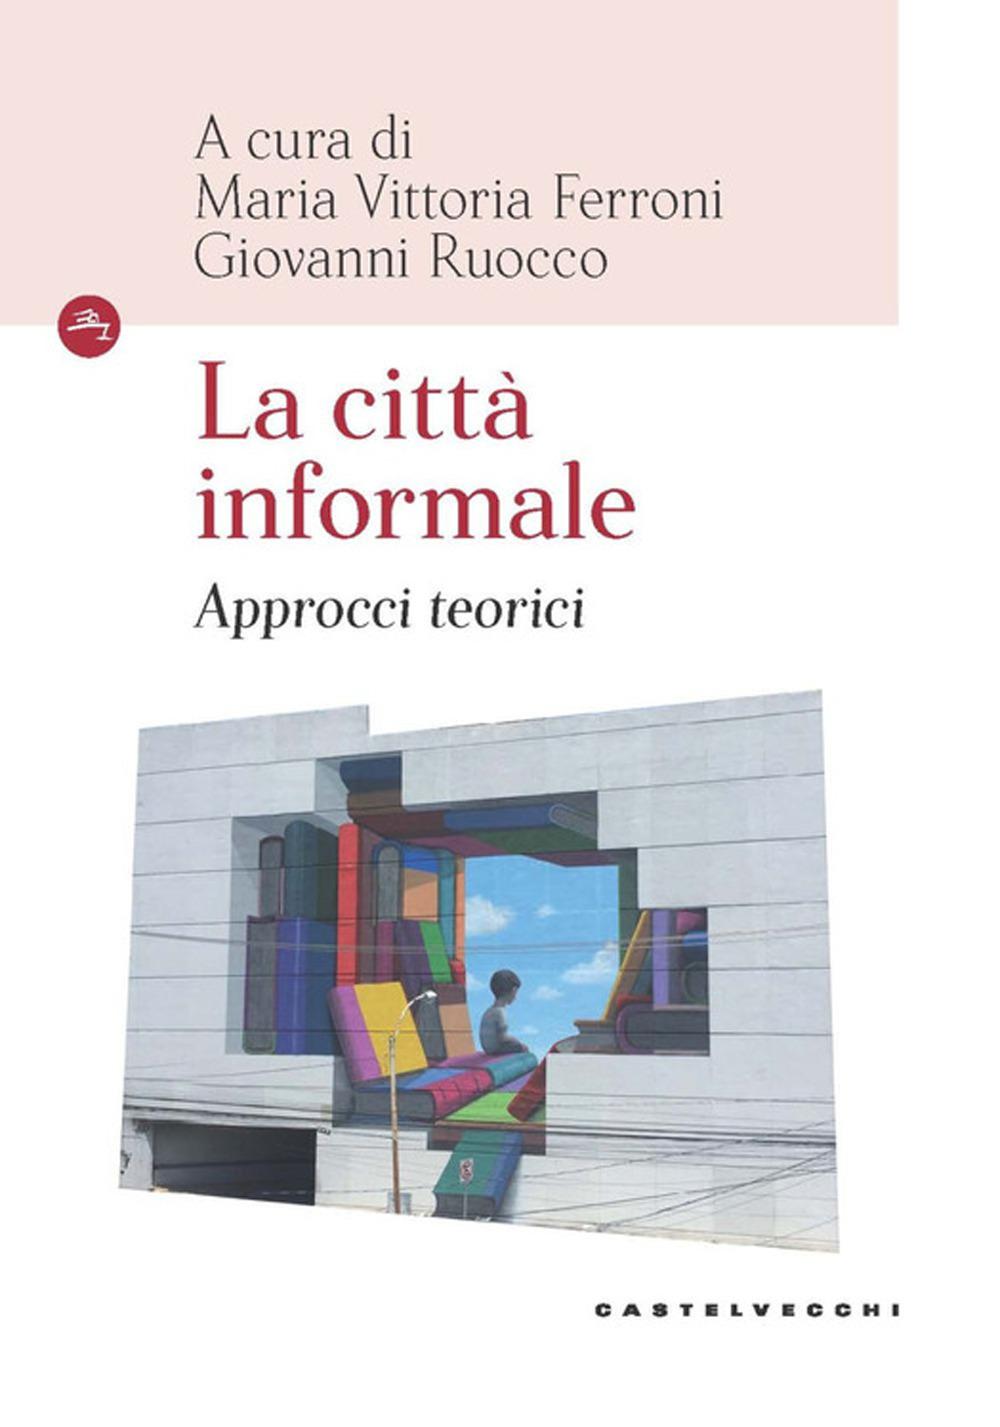 CITTÀ INFORMALE. APPROCCI TEORICI (LA) - Ferroni M. V. (cur.); Ruocco G. (cur.) - 9788832903058